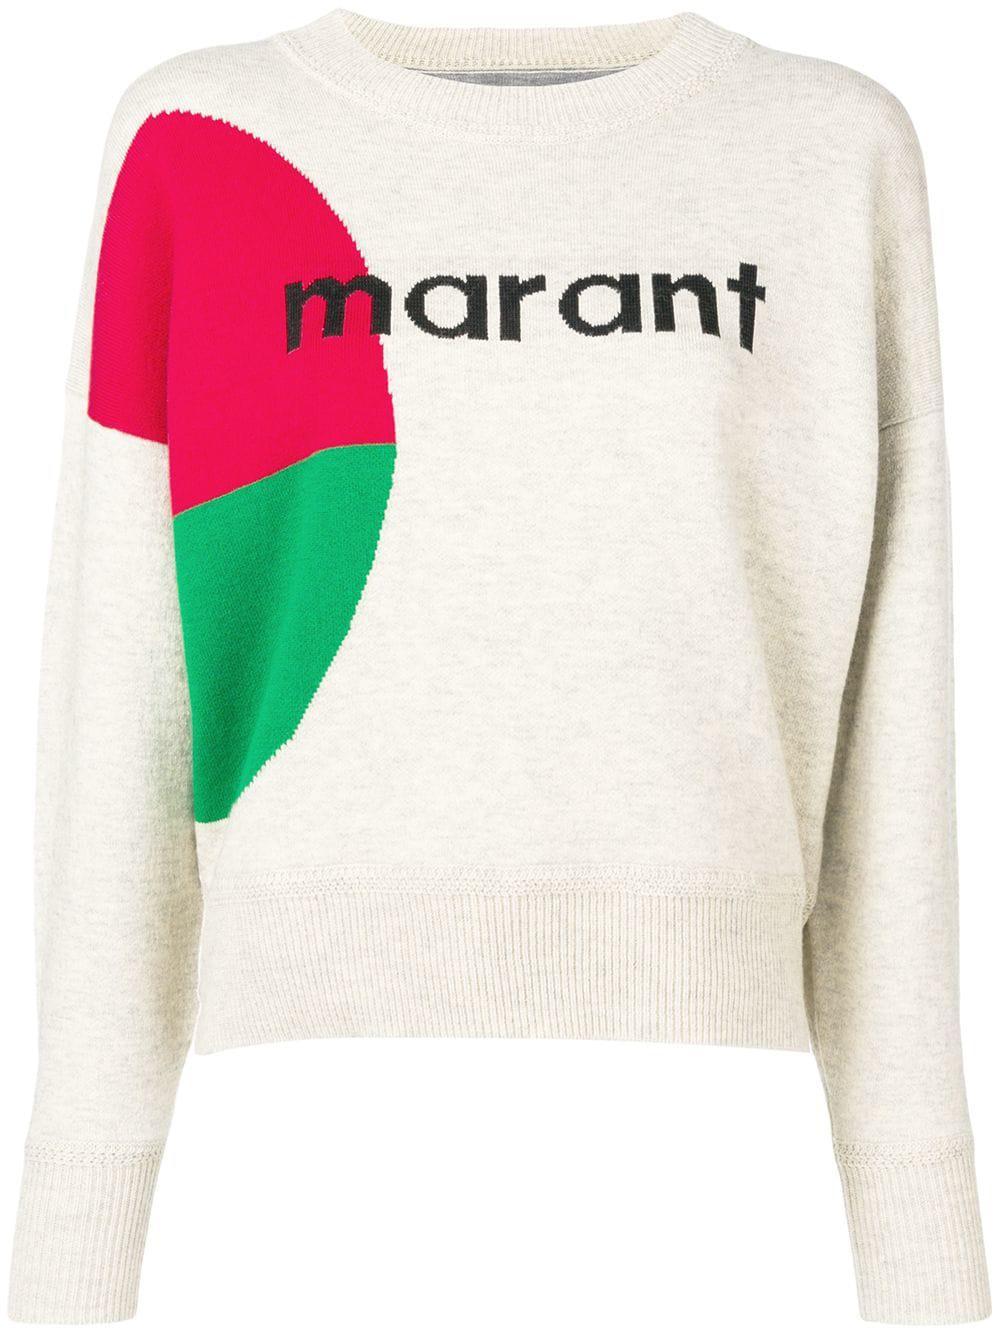 6804cd3ee9 Lyst - Étoile Isabel Marant Korbin Cotton Blend Sweater in Gray ...